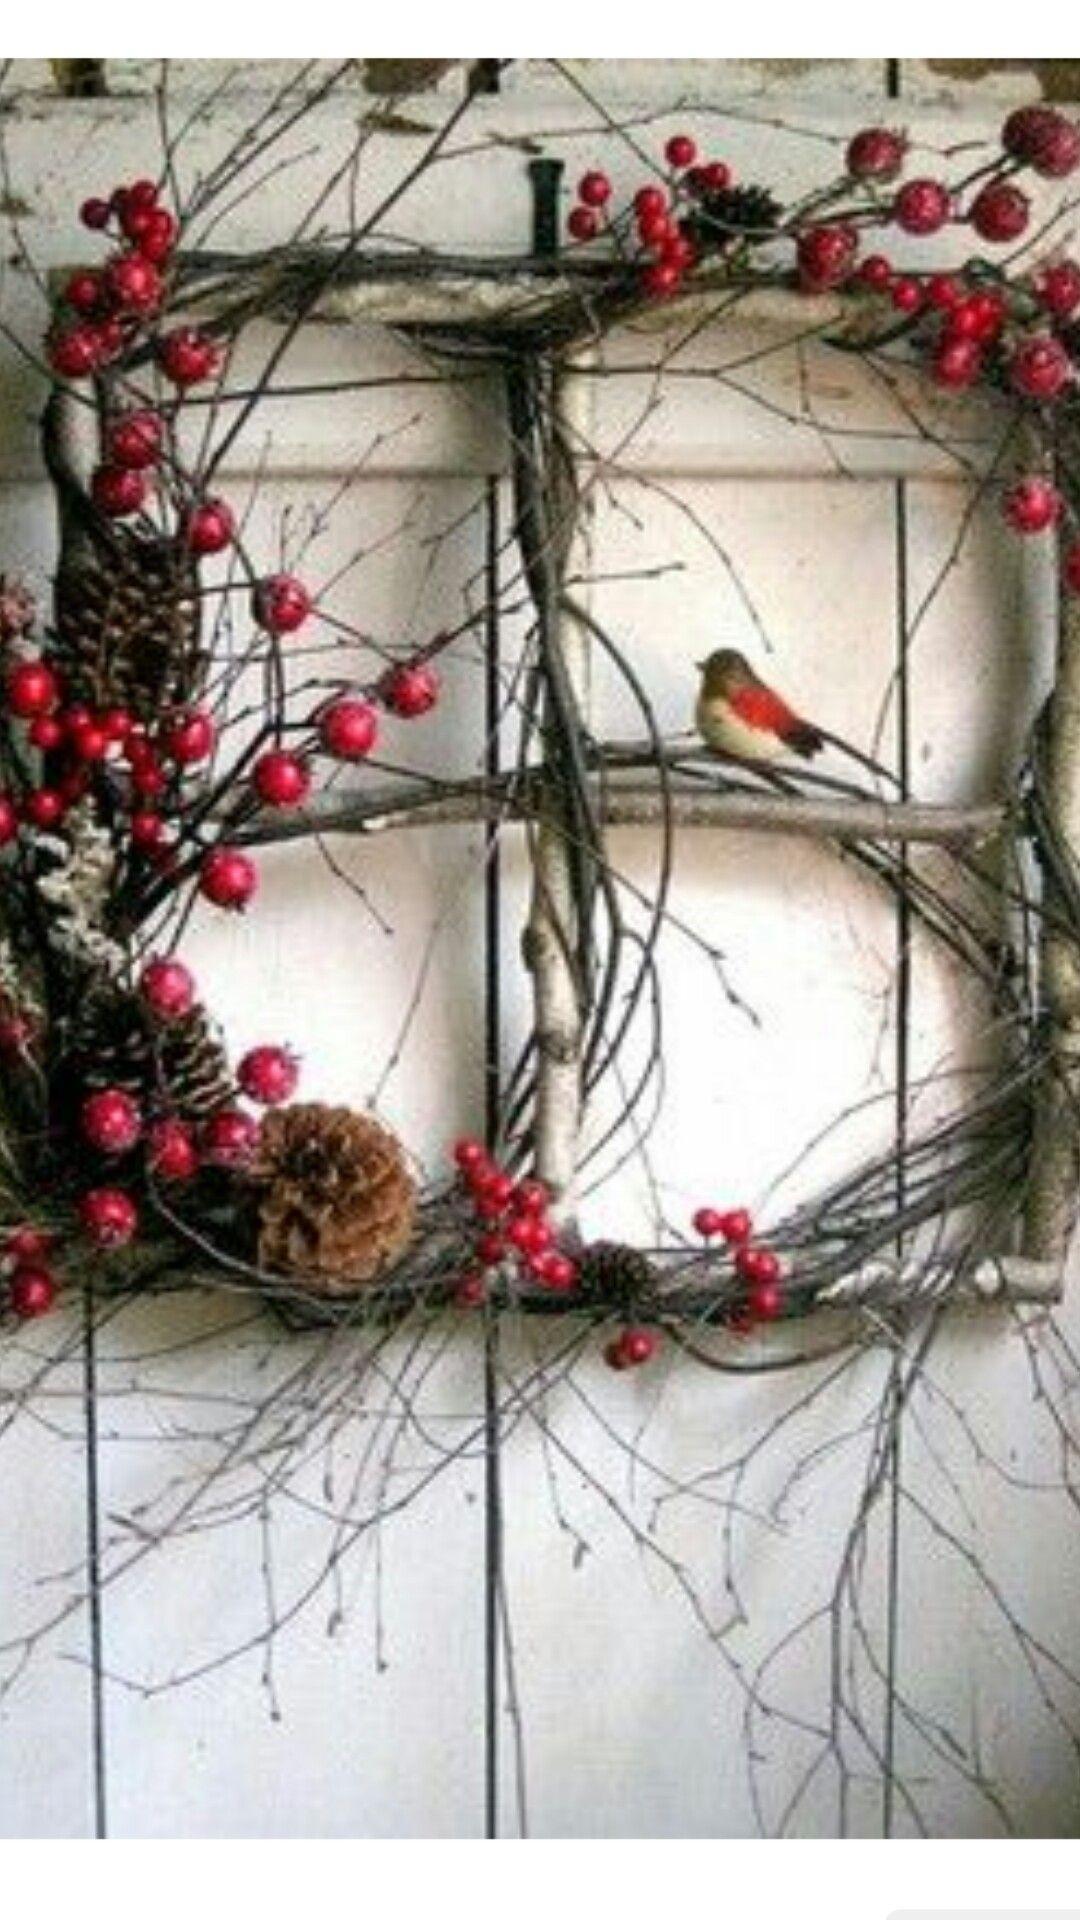 Window frame decor with wreath  pin by mihaela stanciu on mi  pinterest  wooden window frames